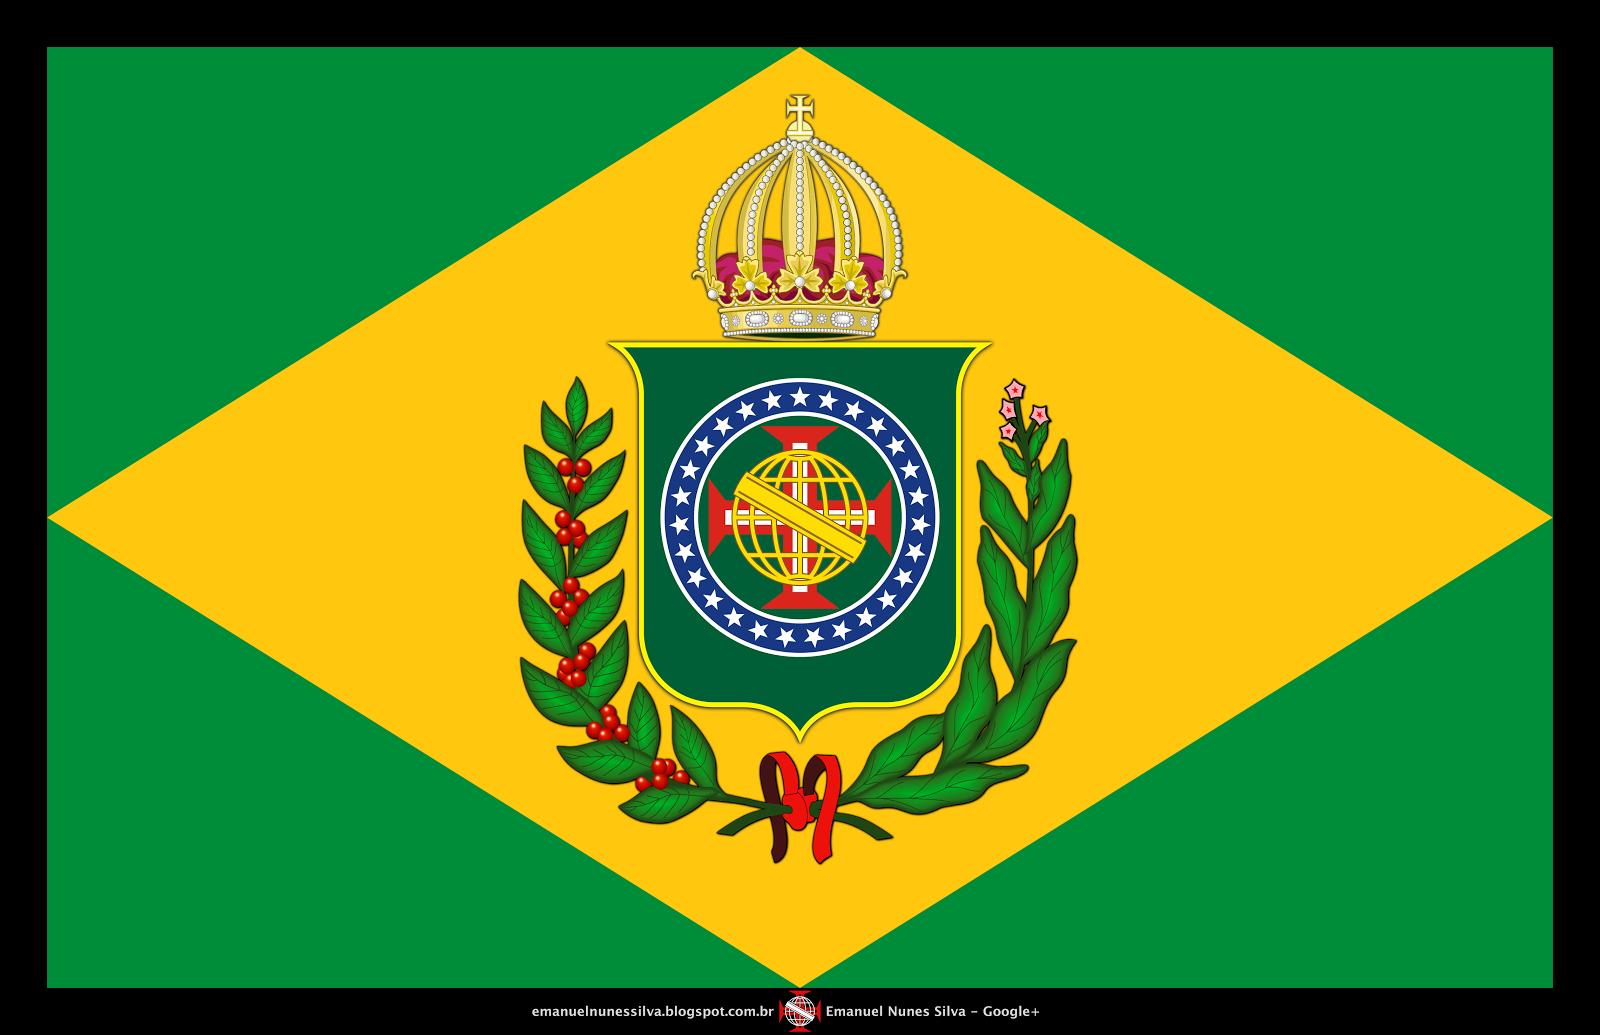 Bandeira do Brasil Imperial - Modelo (10 X 16) - Atualizada - Crédito: Emanuel Nunes Silva